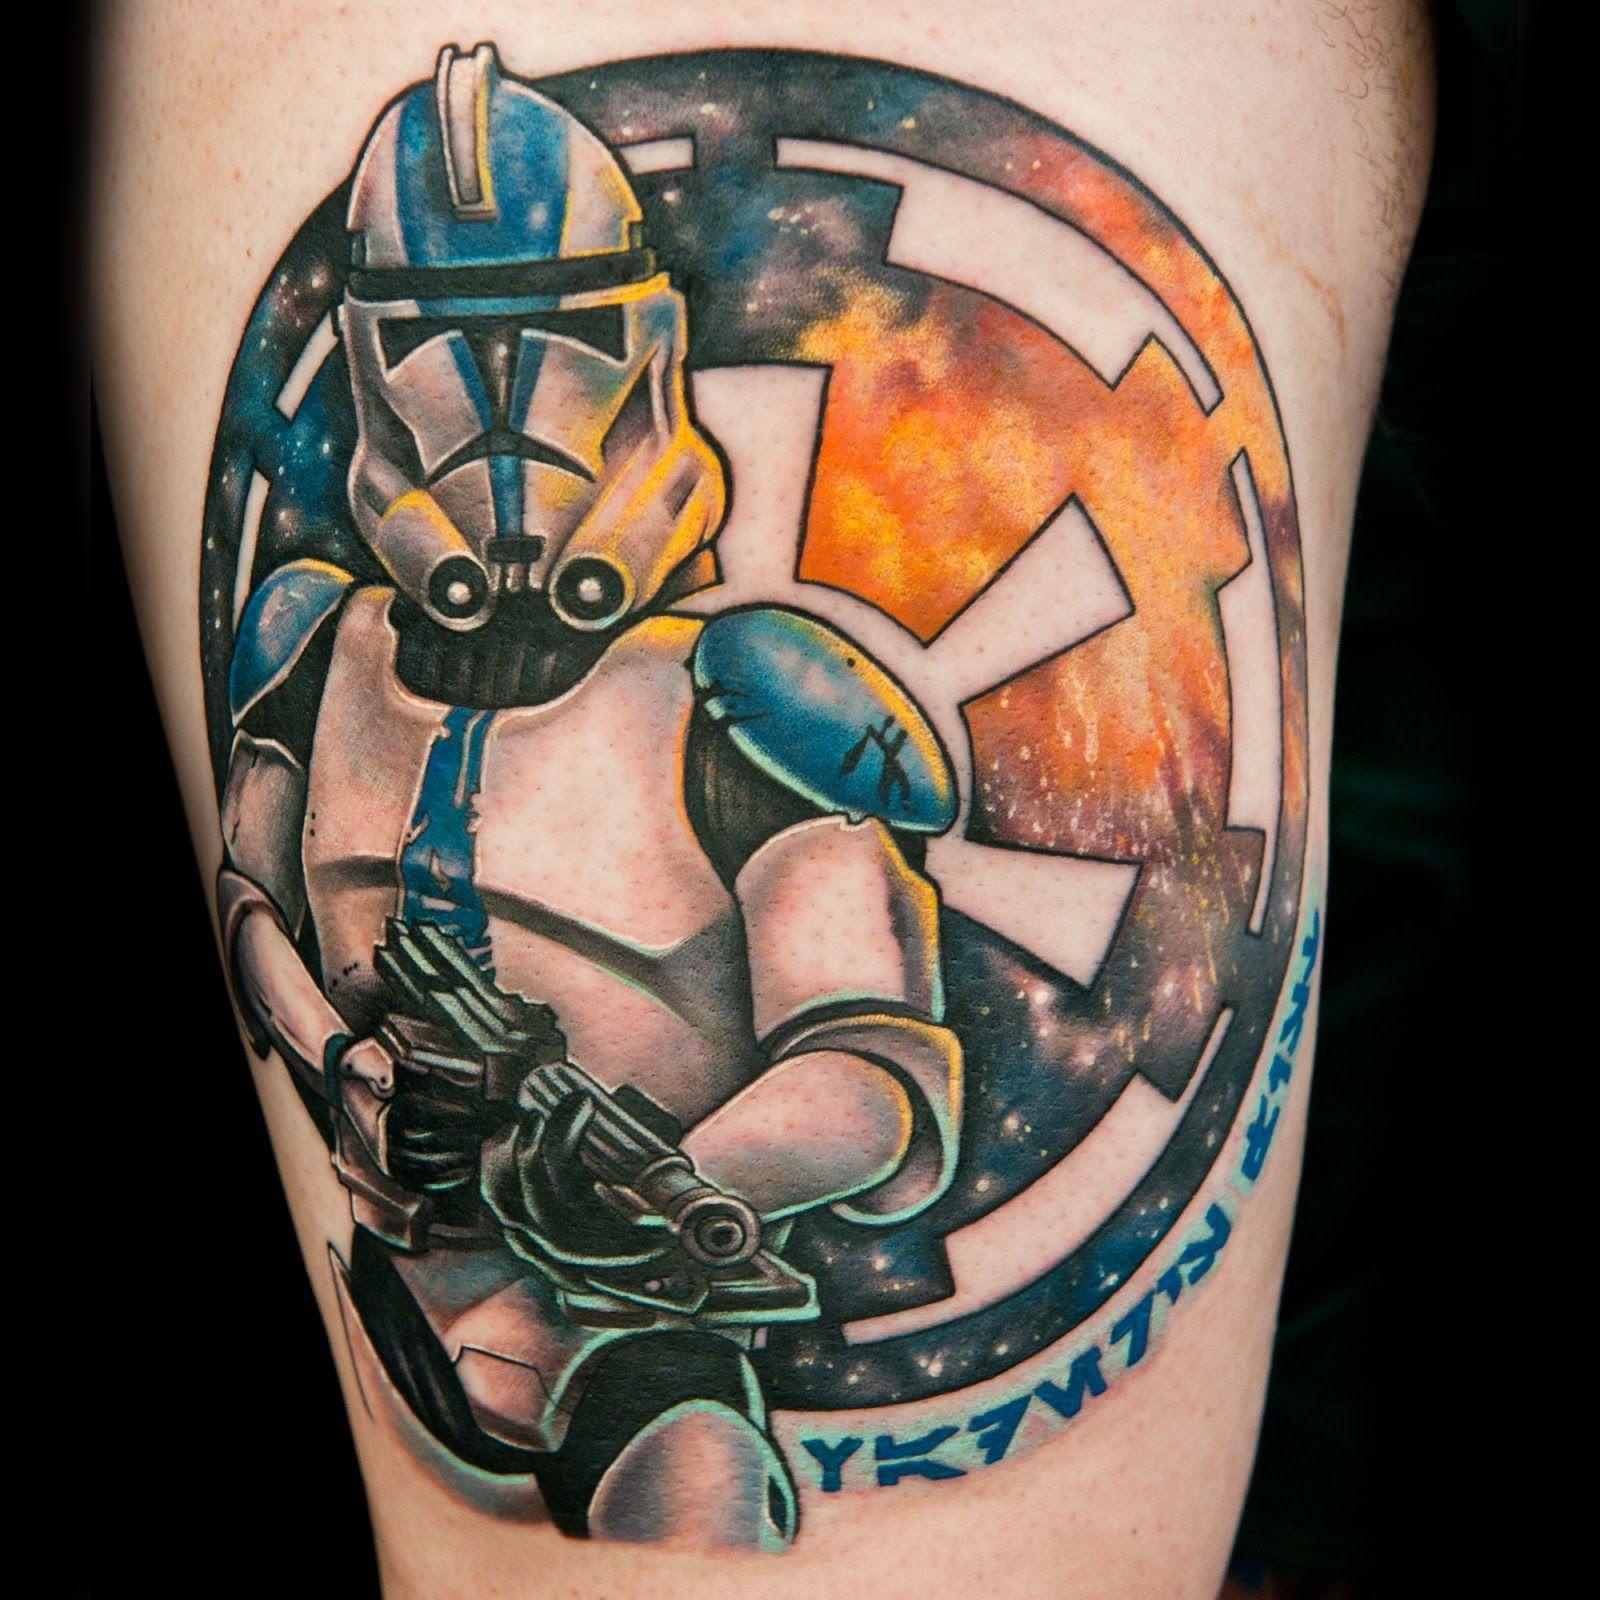 ink master season 3 tattoo baby Ricky The Aggie Panda